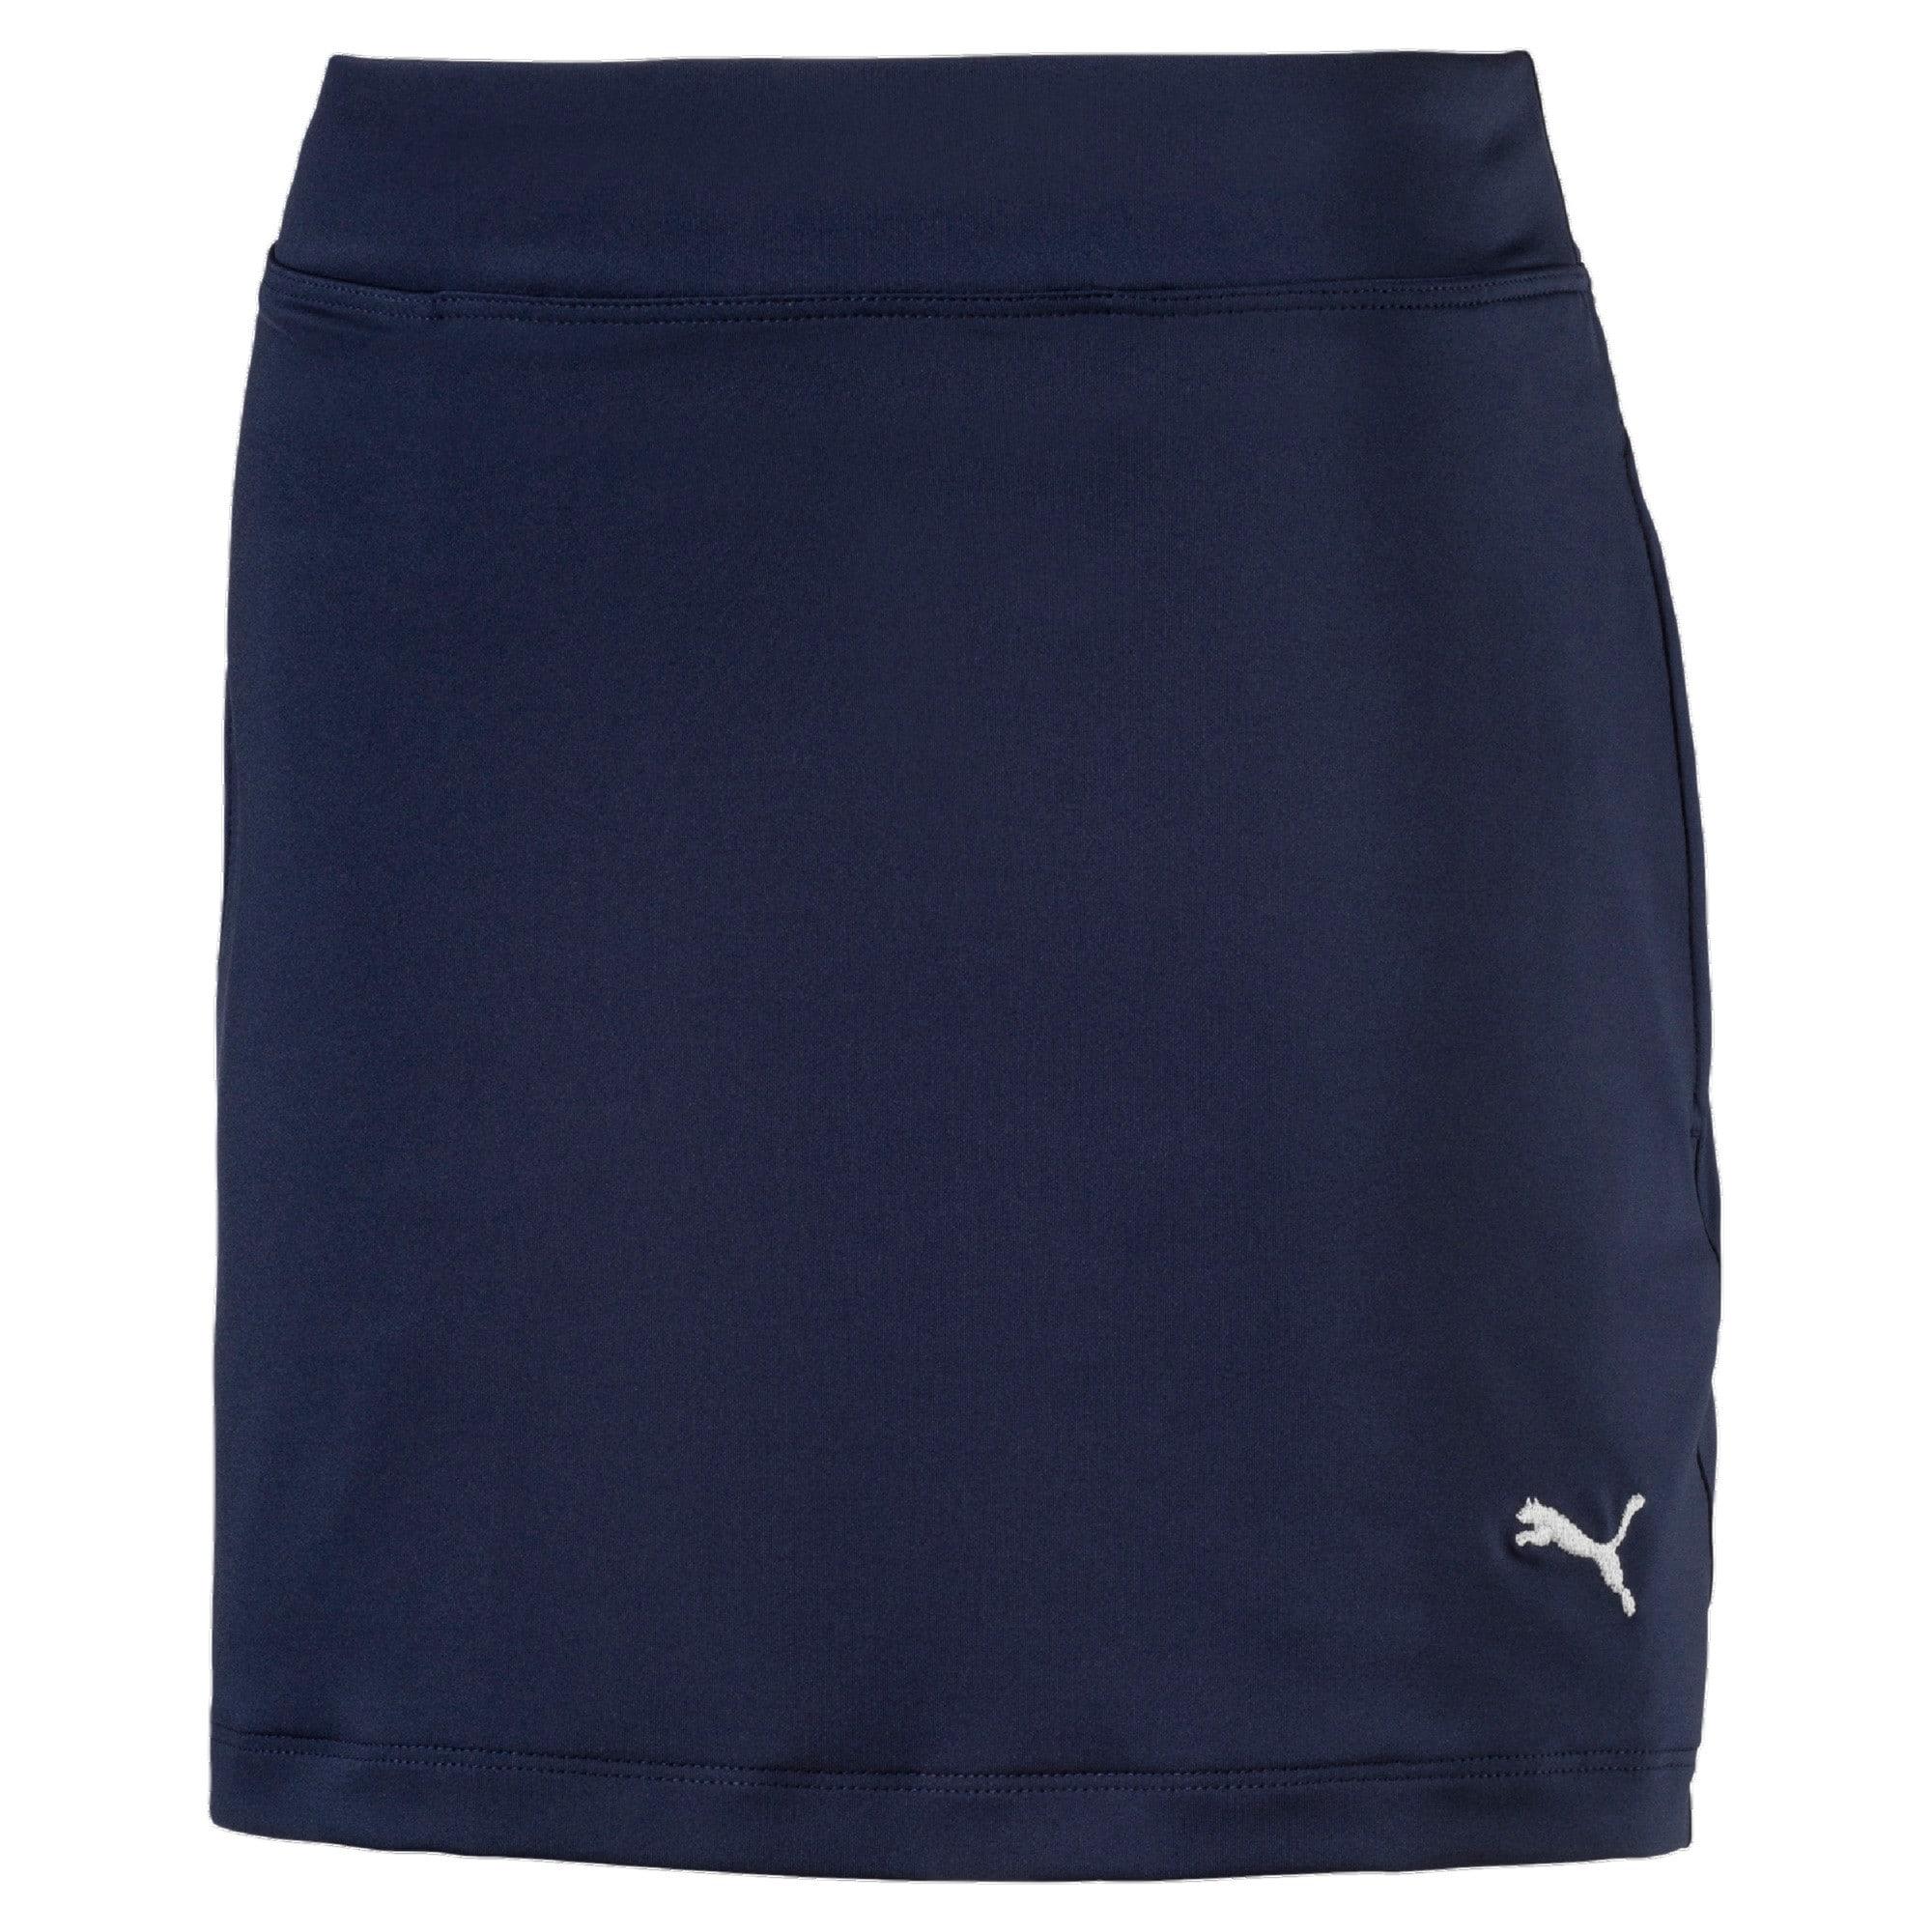 Golf Girls' Solid Knit Skirt, Blauw, Maat 152 | PUMA